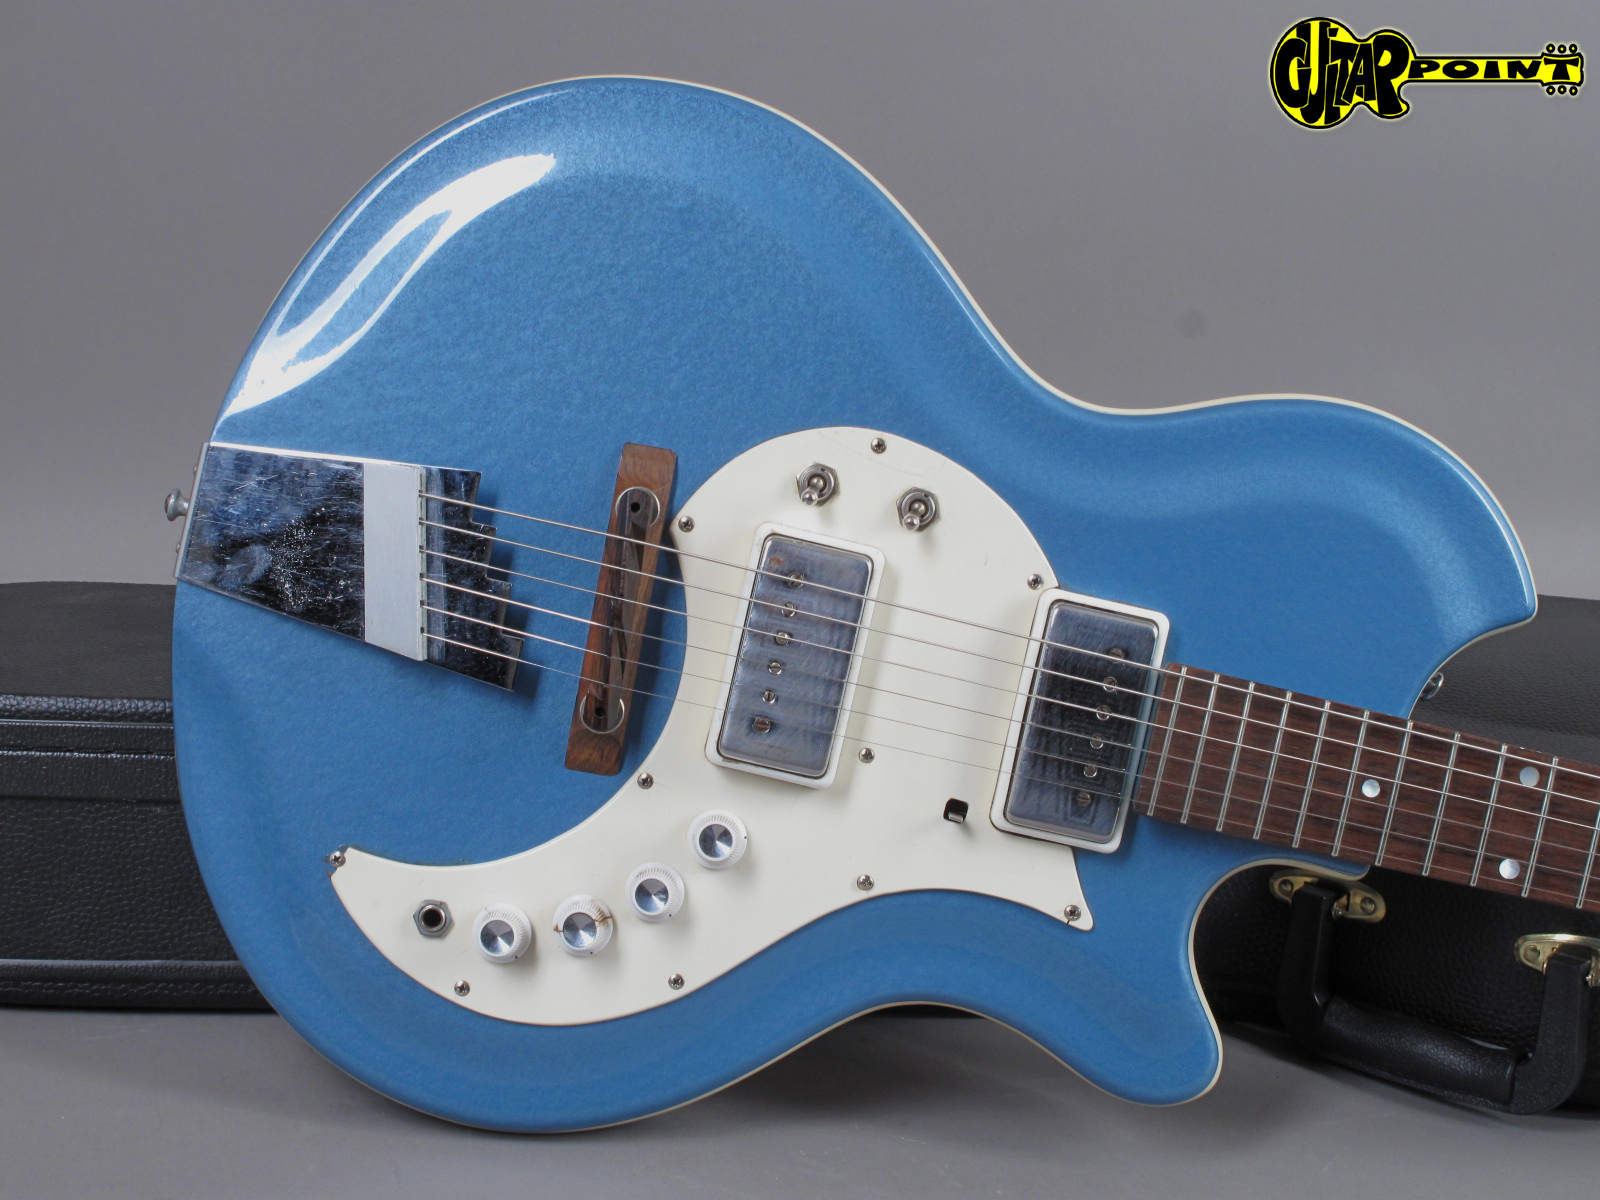 https://guitarpoint.de/app/uploads/products/1965-supro-tremo-lectric-wedgewood-blue/Vi65SupTreBlG39029_15.jpg